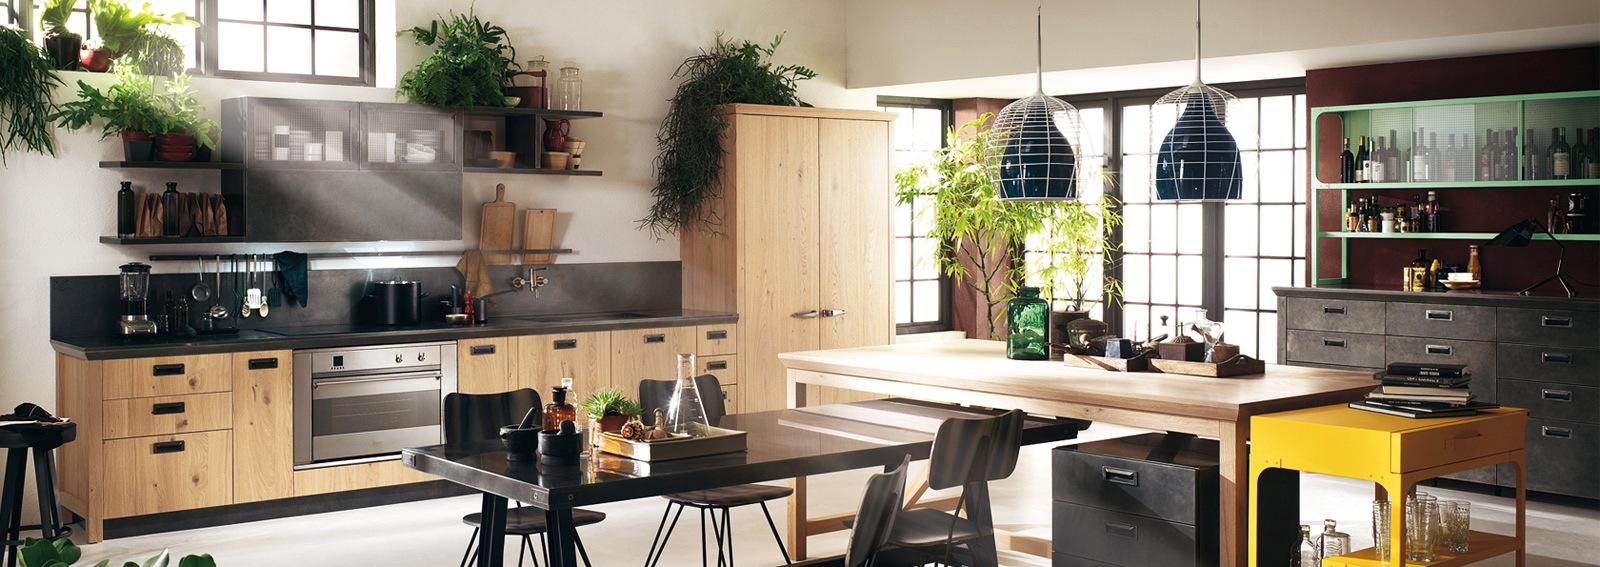 Beautiful Cucine Stile Industriale Ideas - Acomo.us - acomo.us